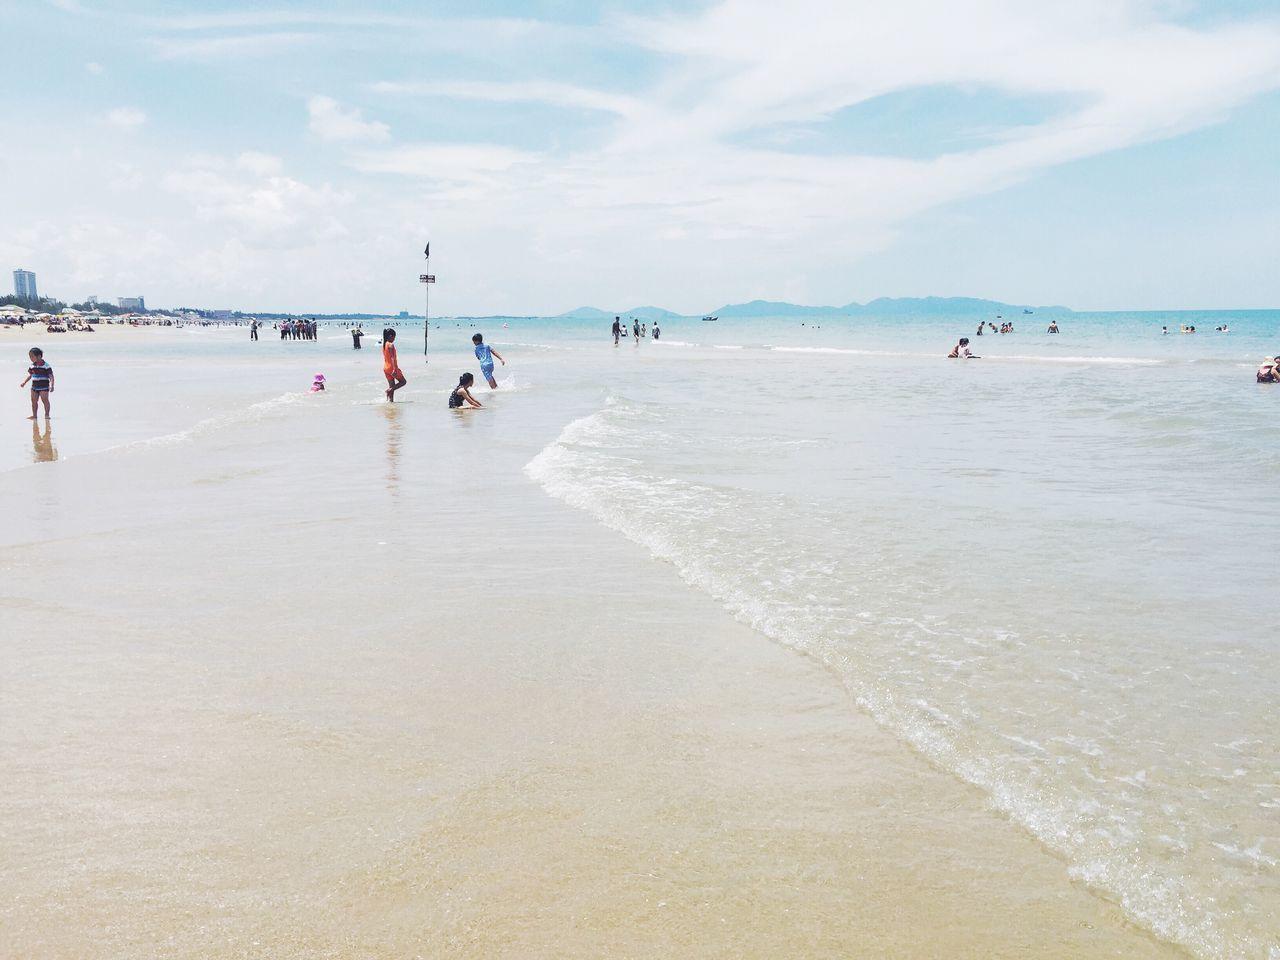 Capturing Freedom Vungtau Vietnam Beach Kids Fun The Broad Life Thebroadlife